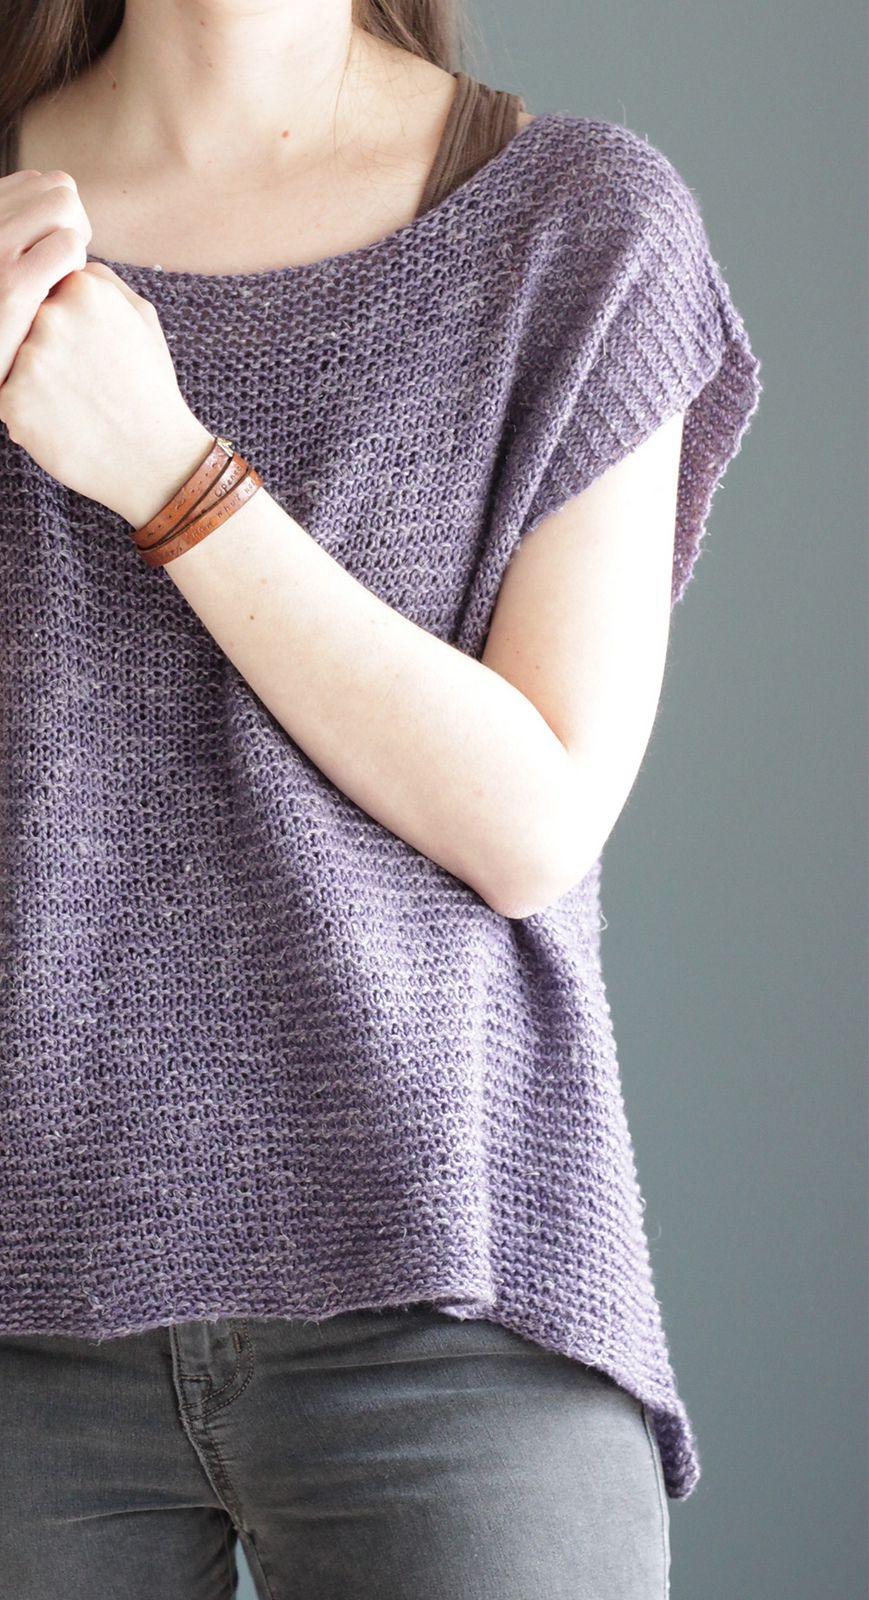 Jessie\'s Girl pattern by Elizabeth Smith | Elizabeth smith, Spring ...